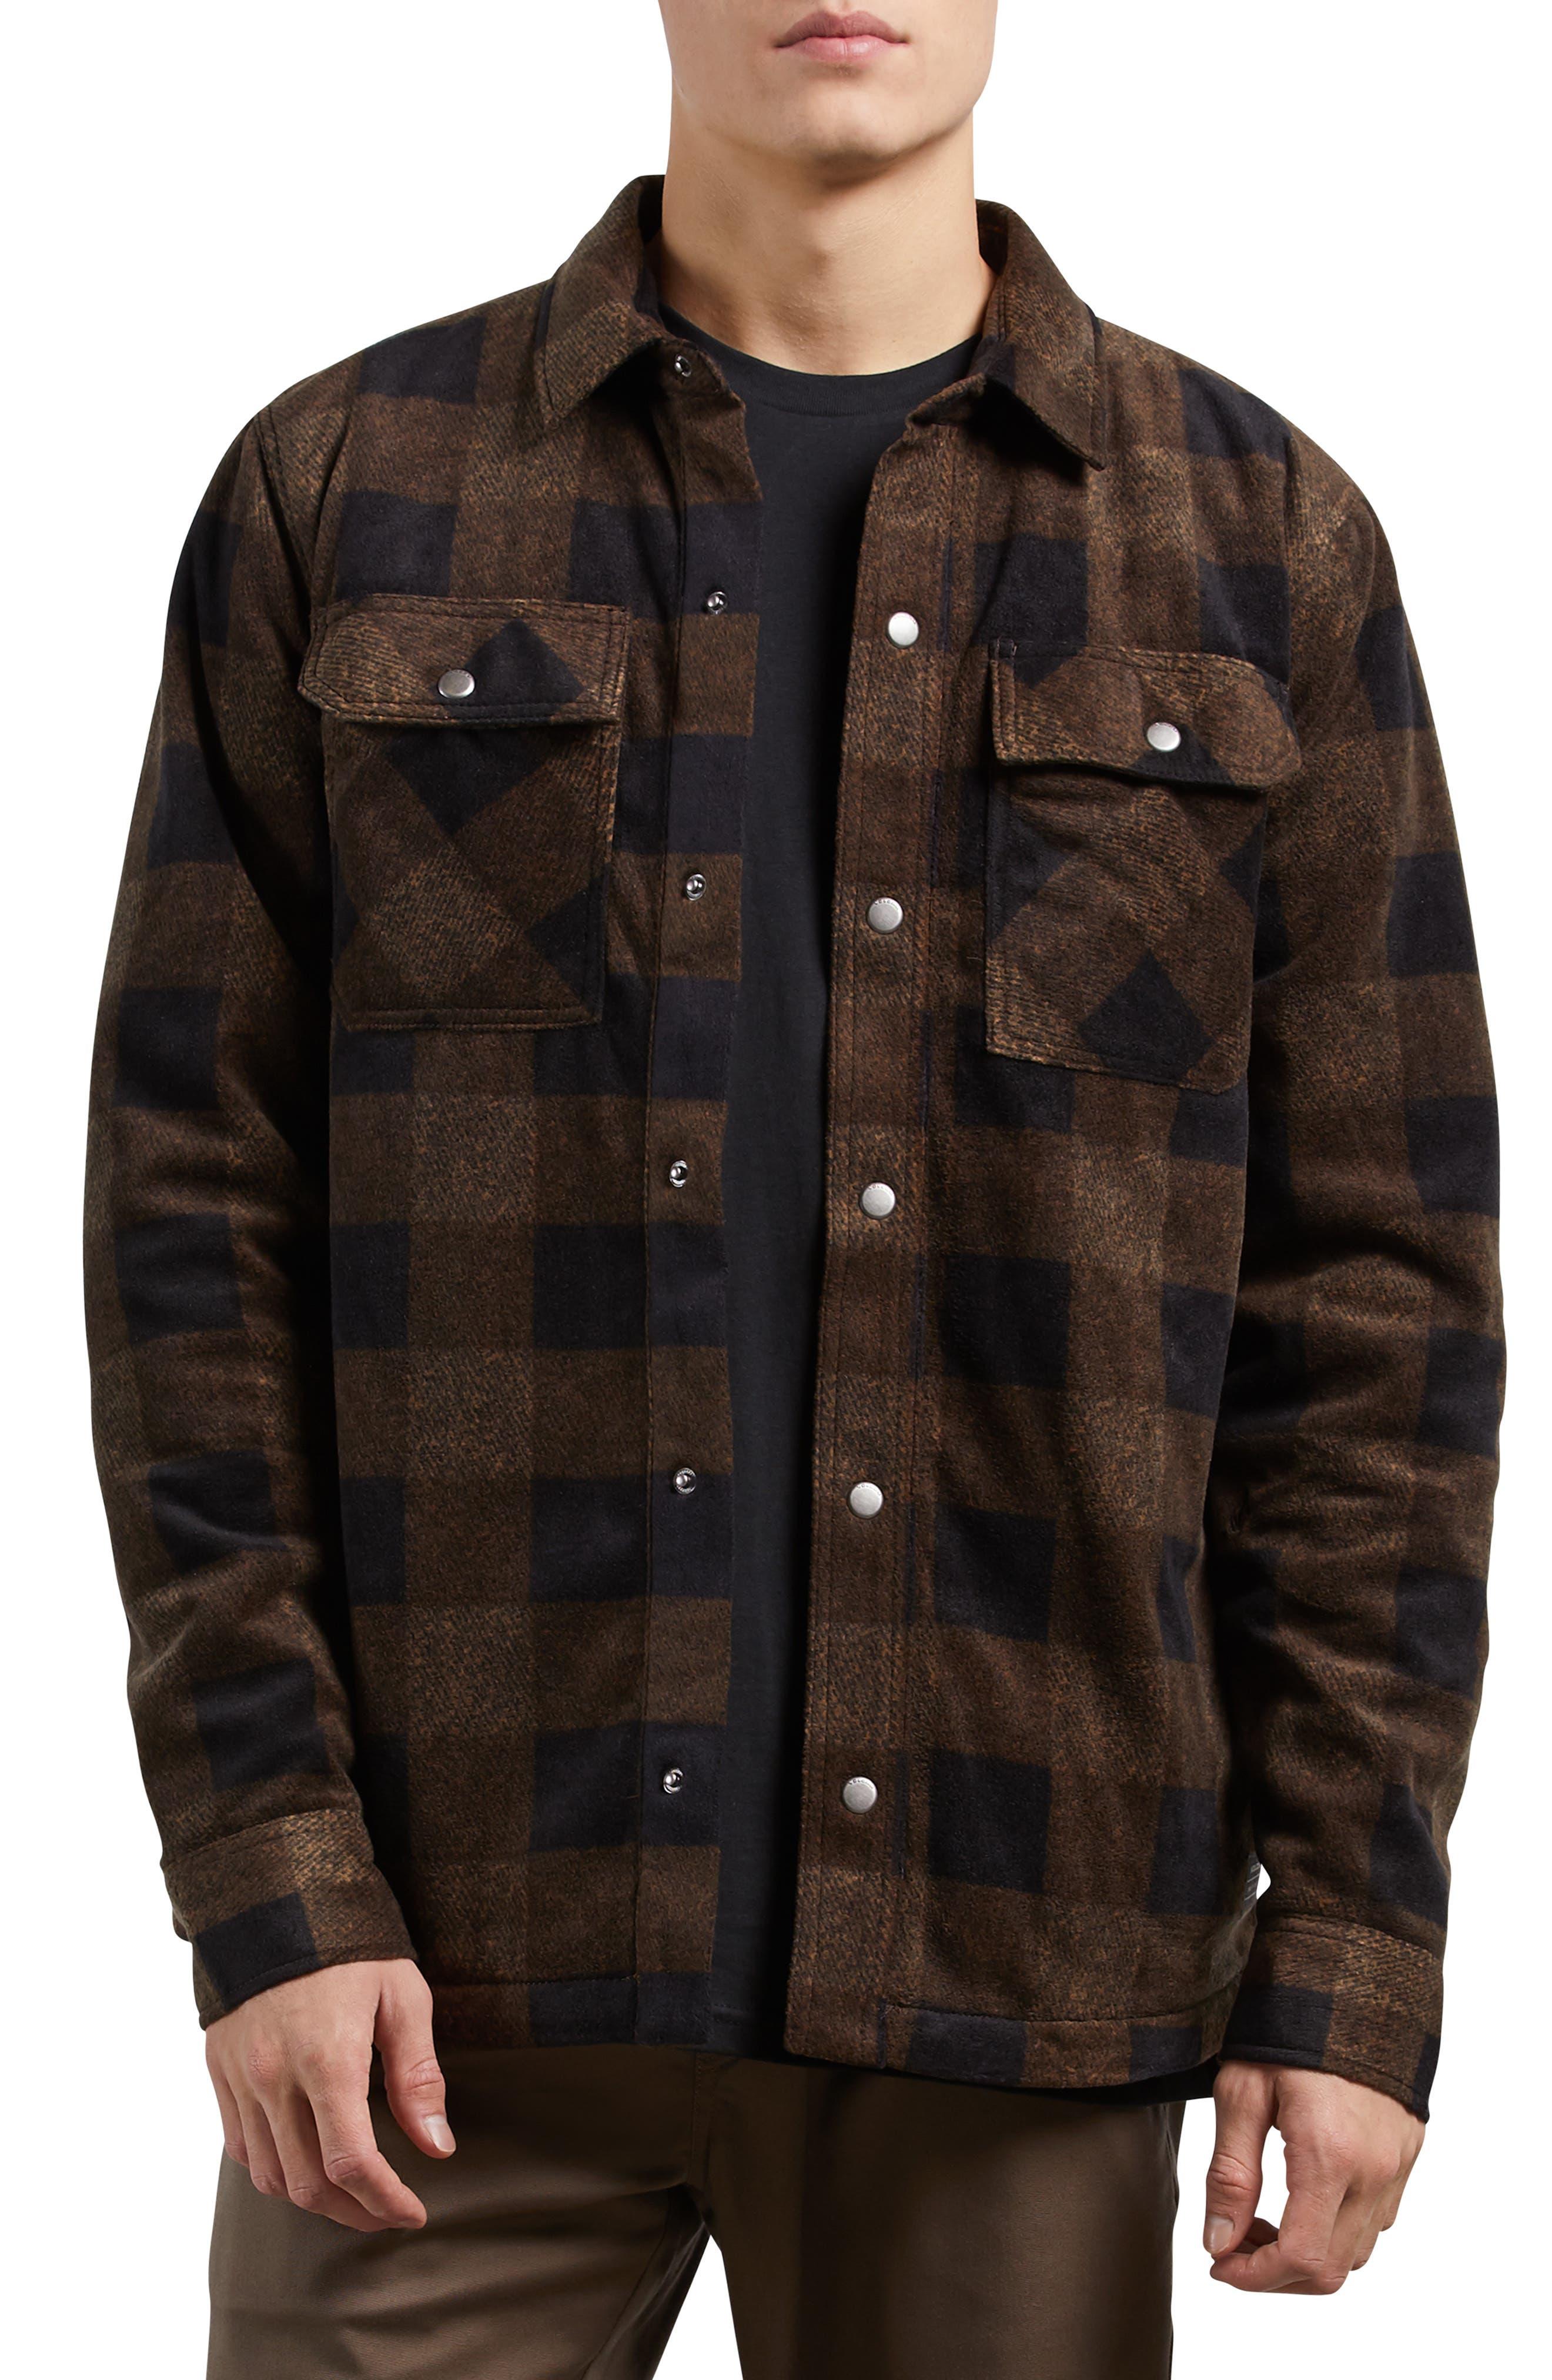 Bower Check Print Fleece Jacket,                             Main thumbnail 1, color,                             800